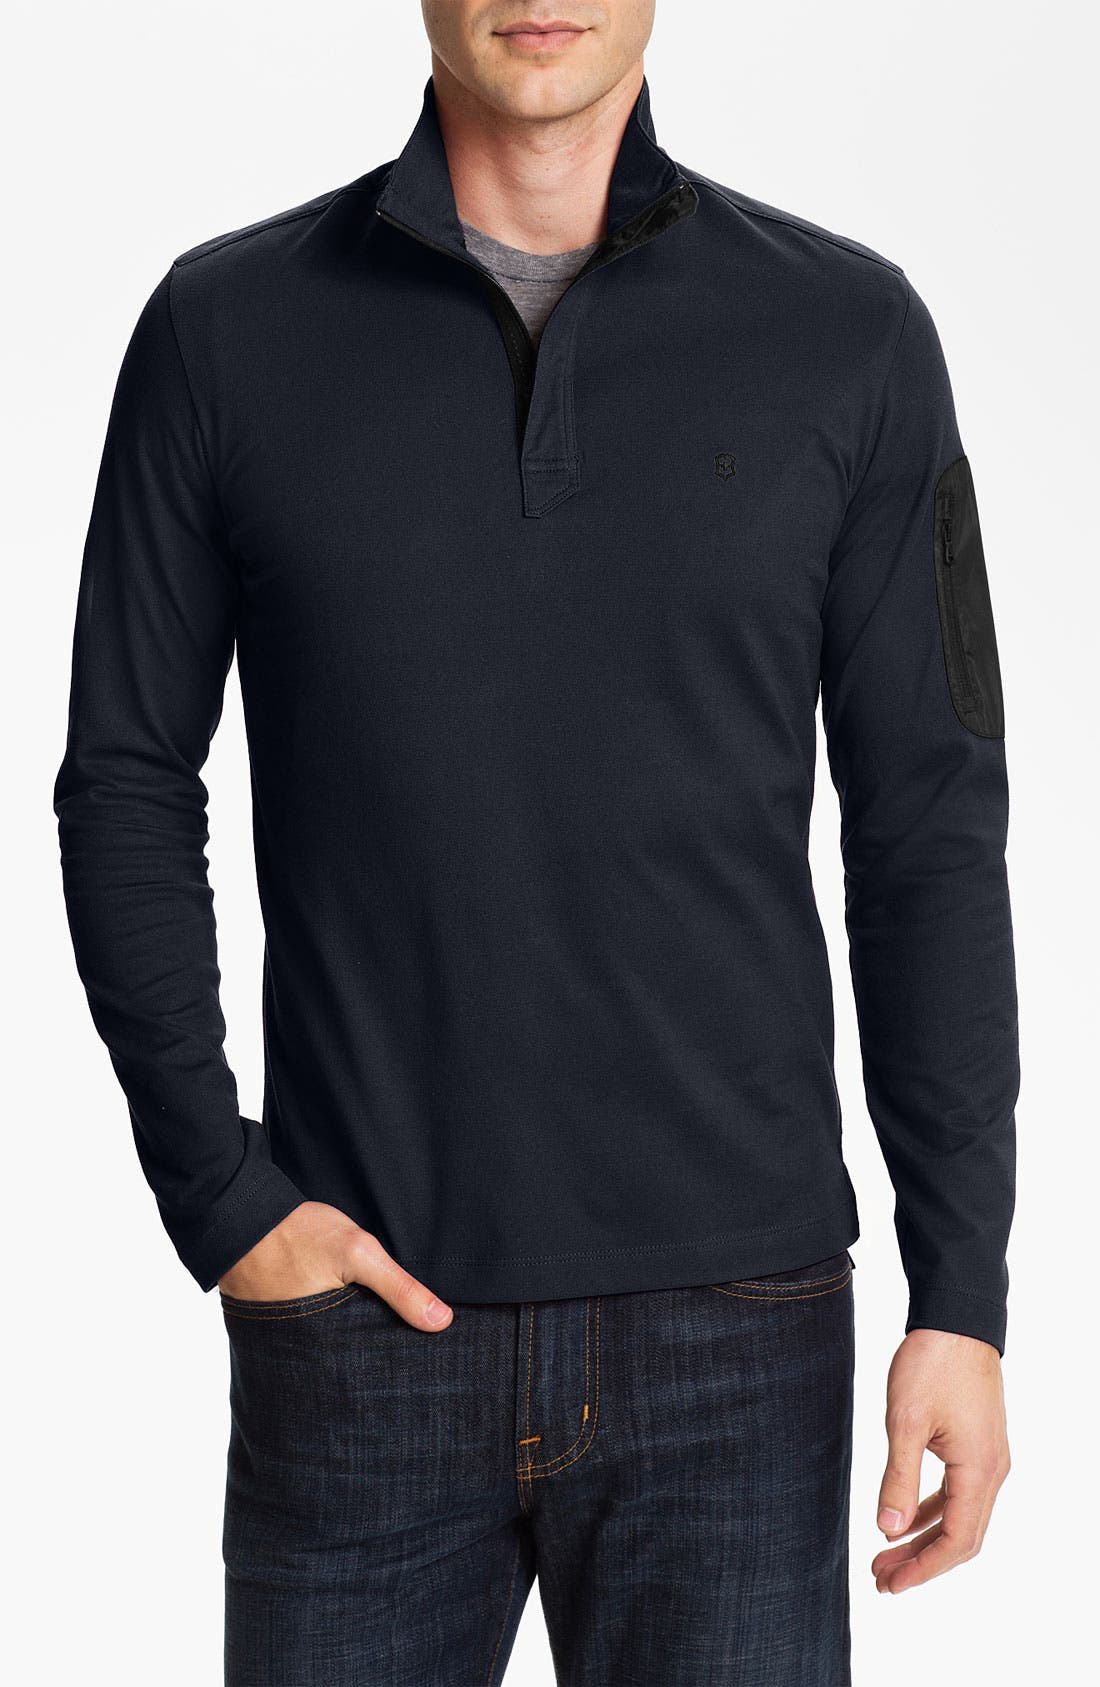 Main Image - Victorinox Swiss Army® Piqué Knit Quarter Zip Shirt (Online Exclusive)